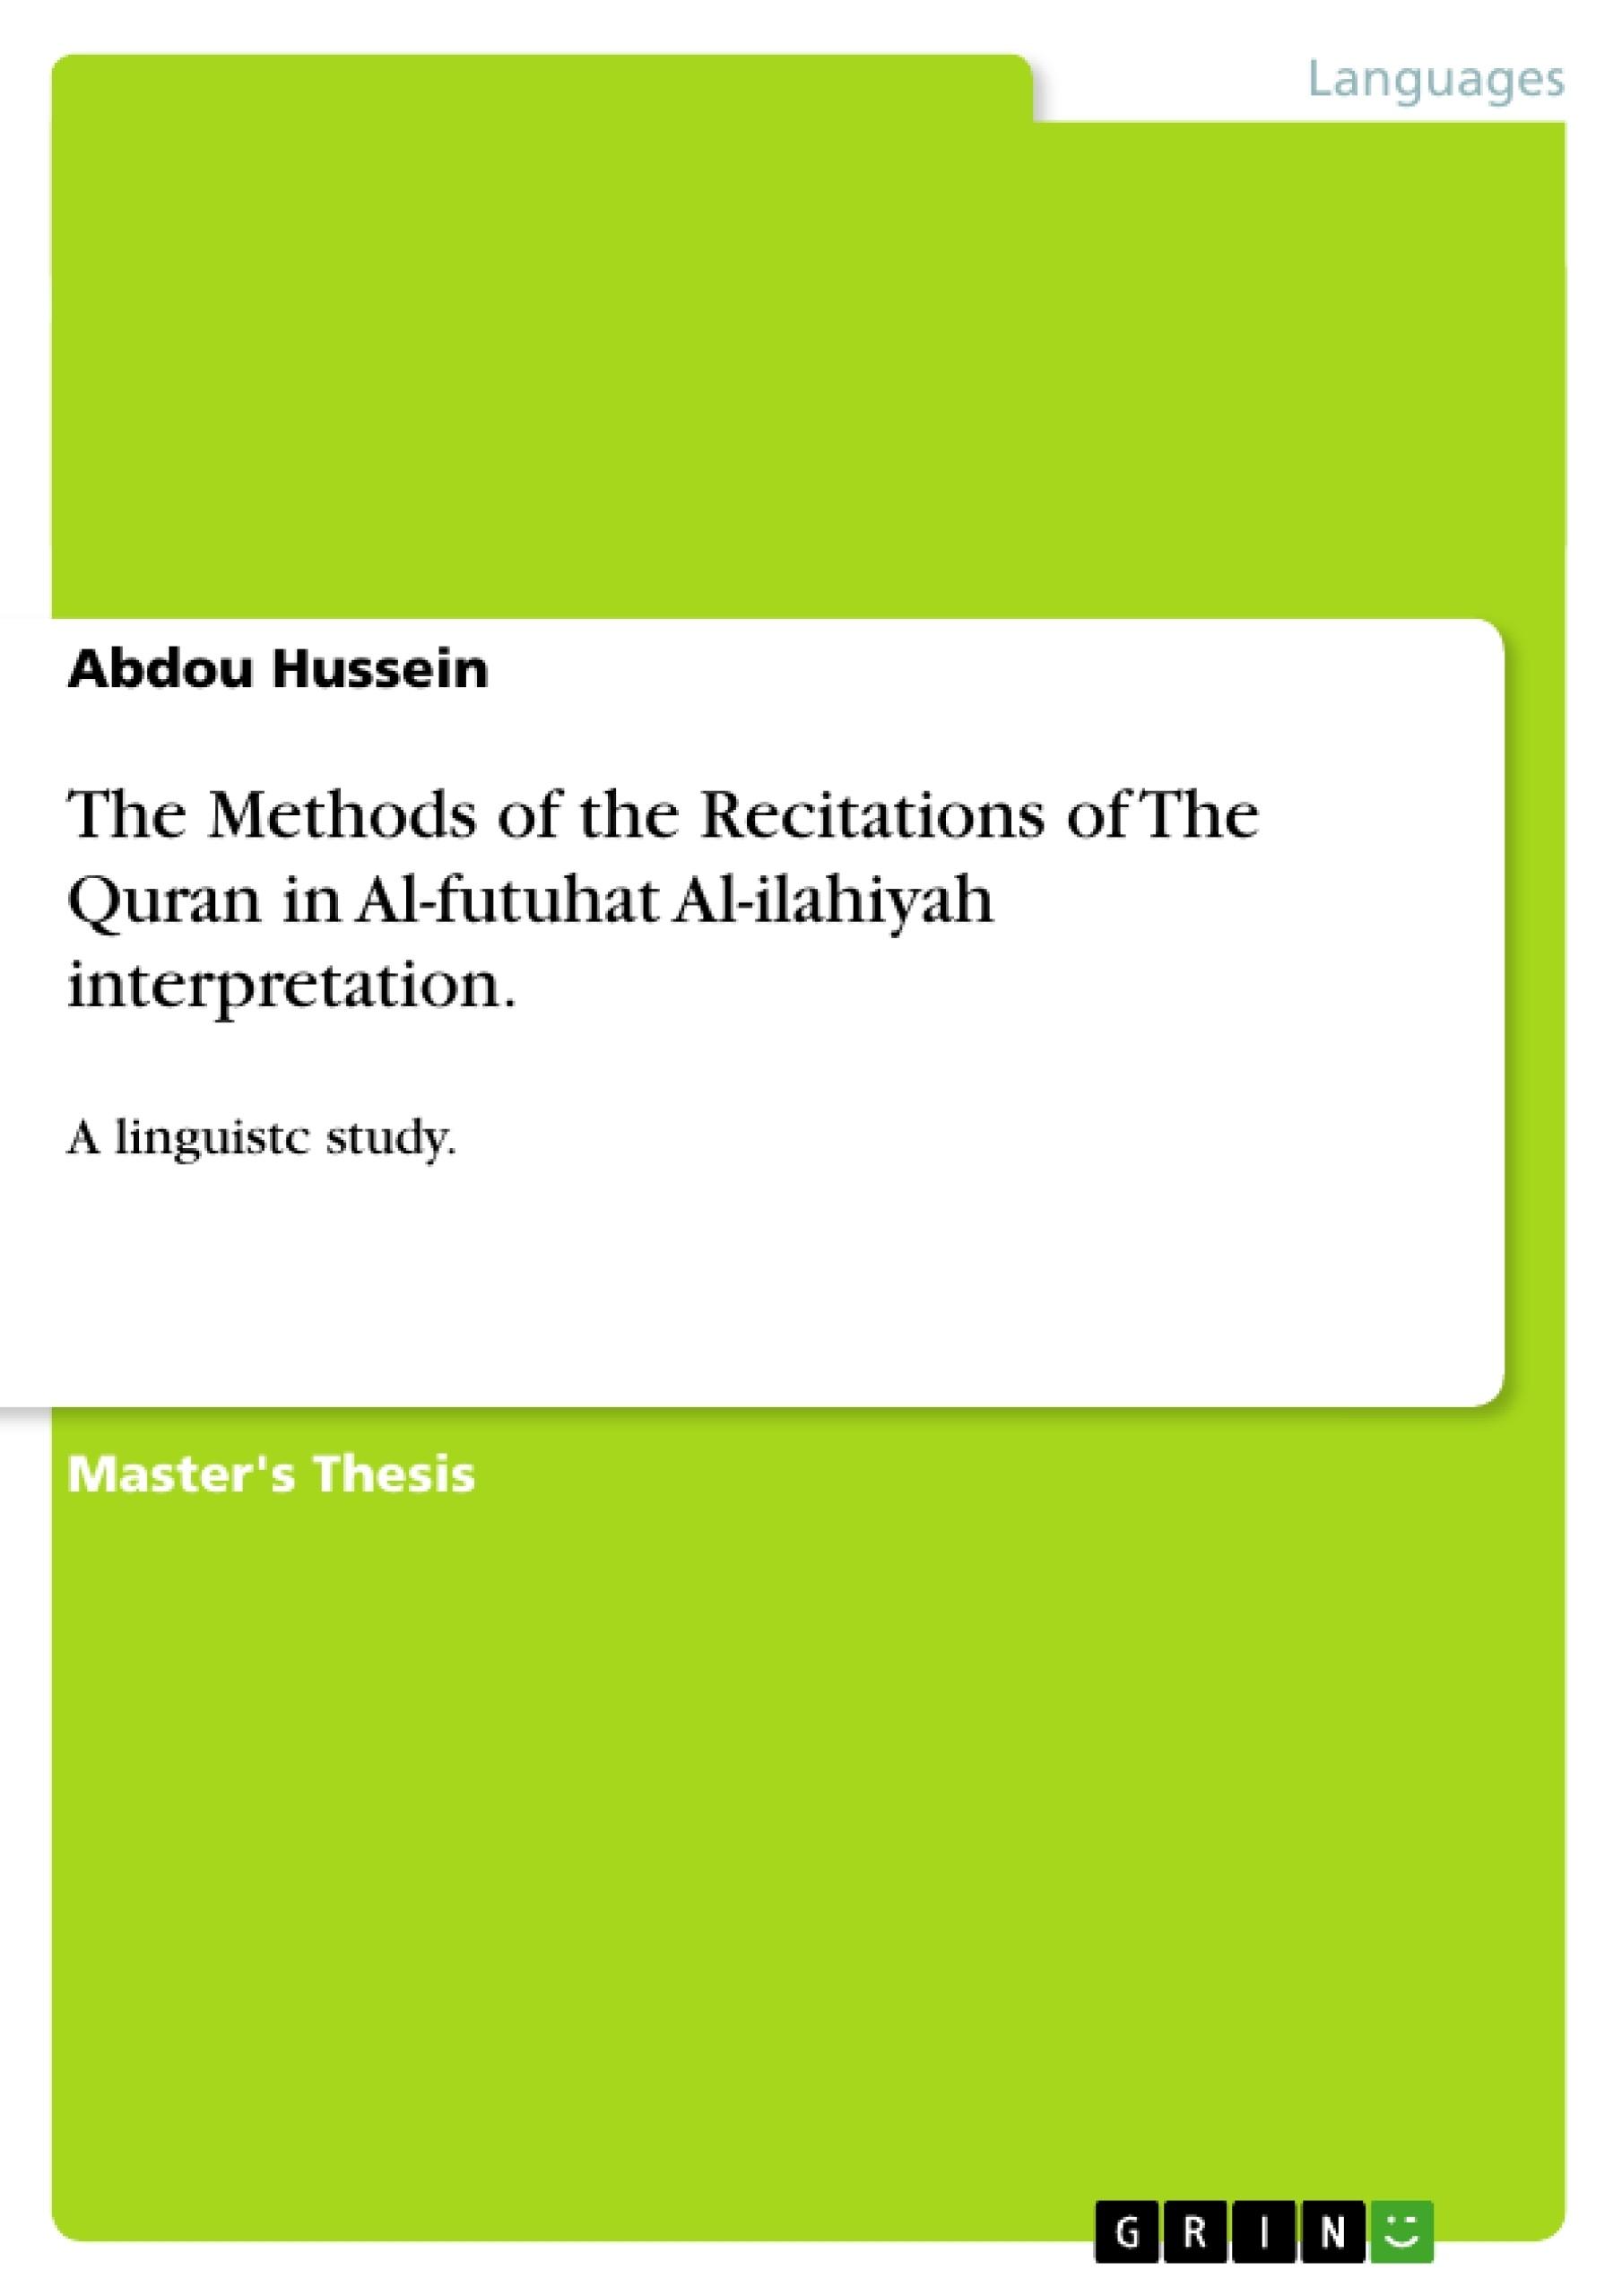 Title: The Methods  of the Recitations of The Quran in Al-futuhat Al-ilahiyah interpretation